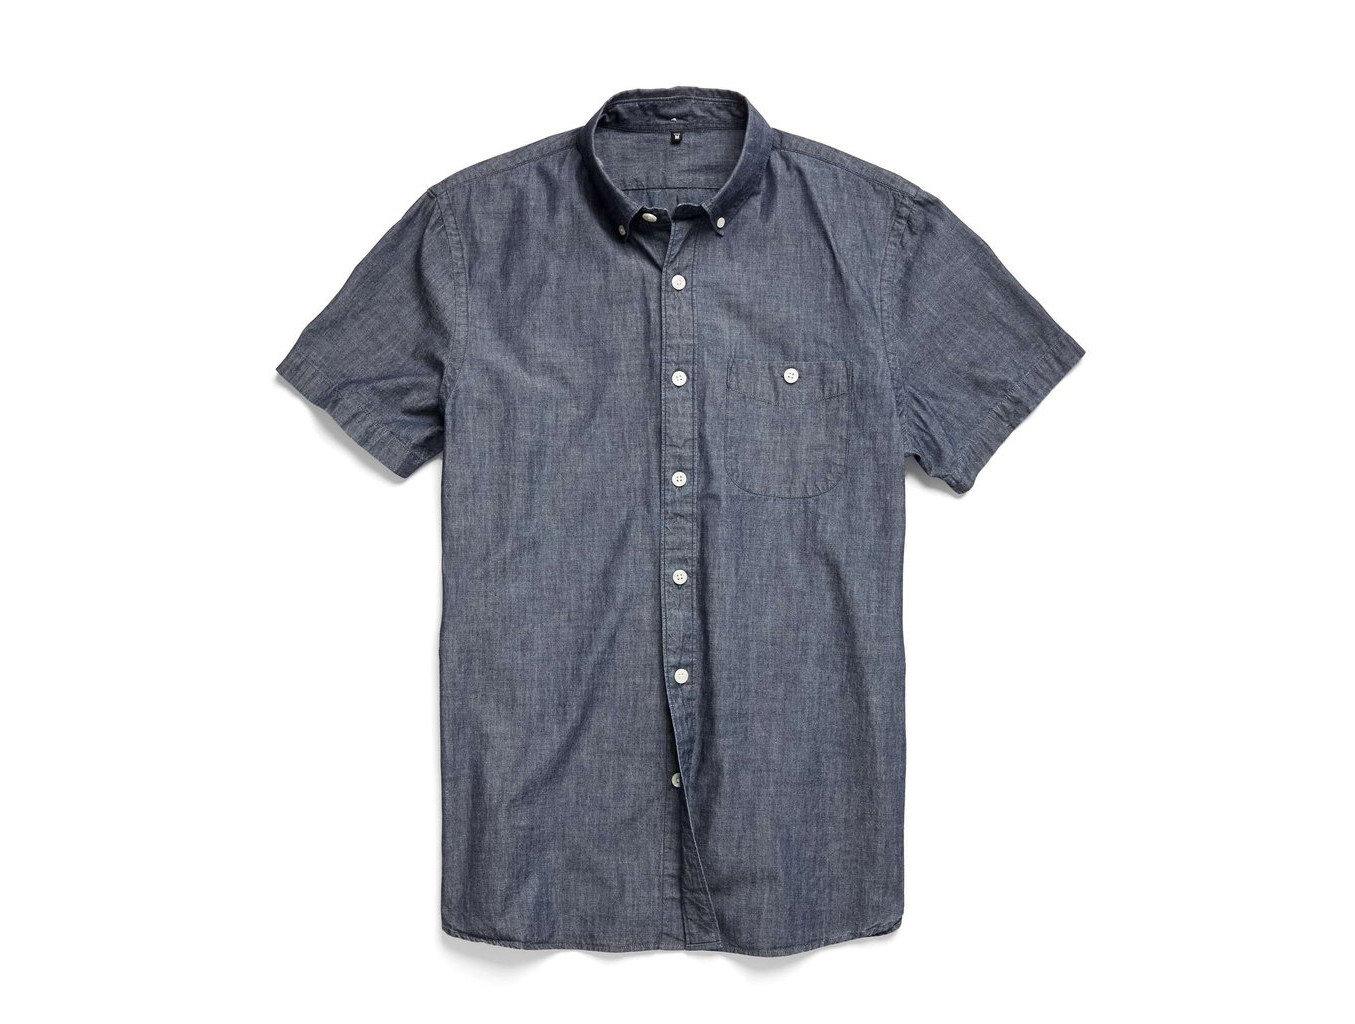 Style + Design Travel Shop clothing sleeve wearing button shirt hat denim coat jacket dress shirt product